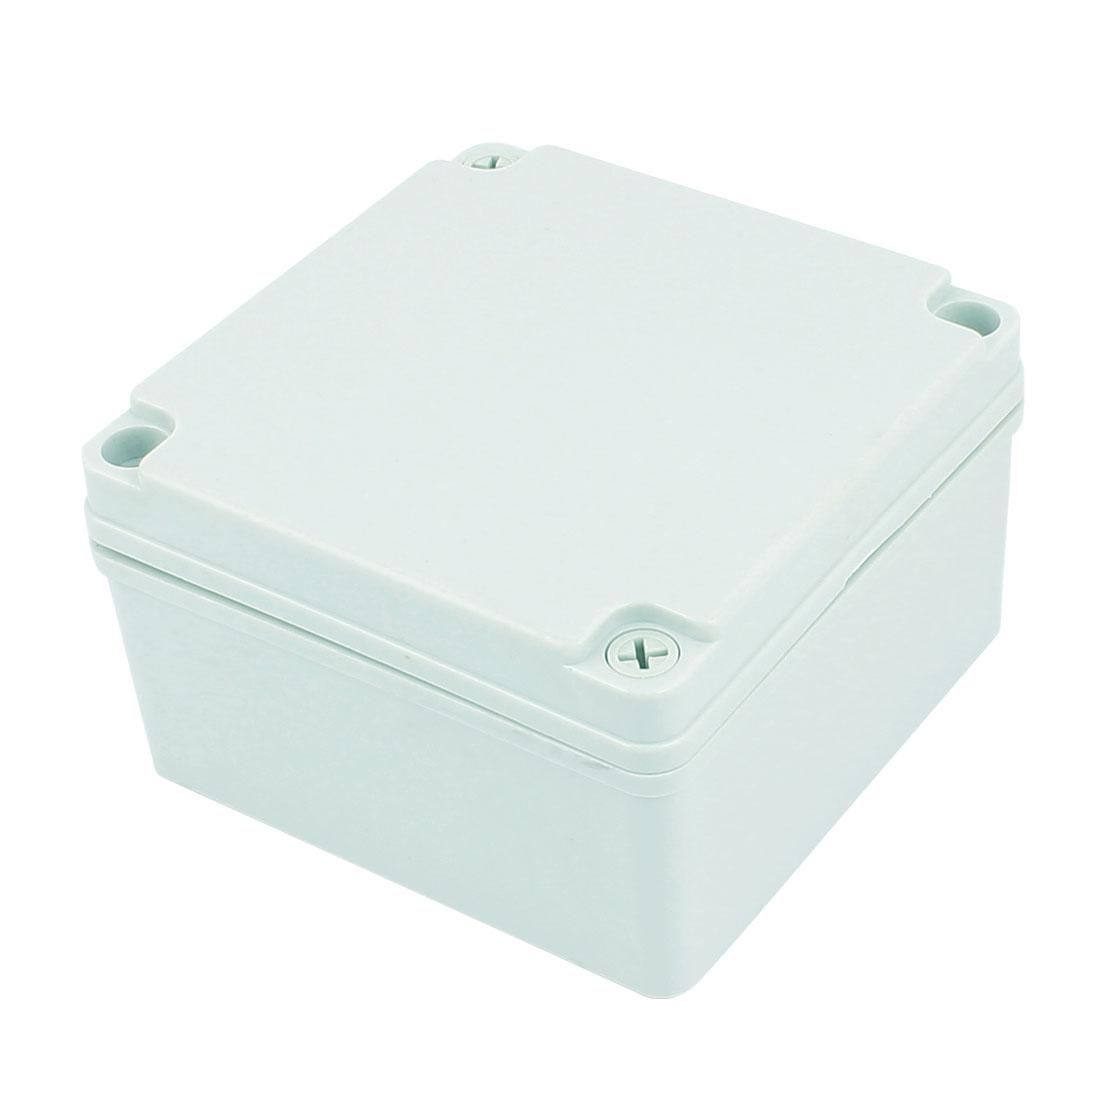 Dustproof IP65 Junction Box DIY Terminal Connection Enclosure Adaptable 117mm x117mm x 67mm